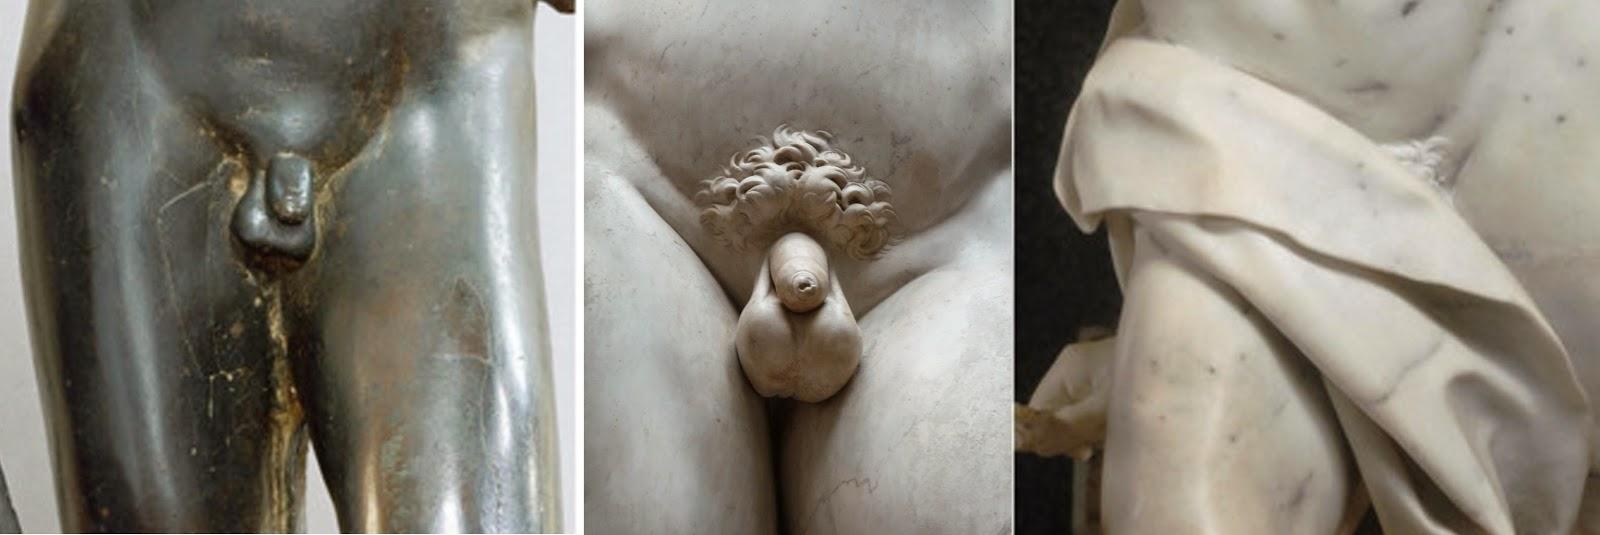 THE FINE ART DINER: 3 Davids, 3 Theologies: Donatello, Michelangelo